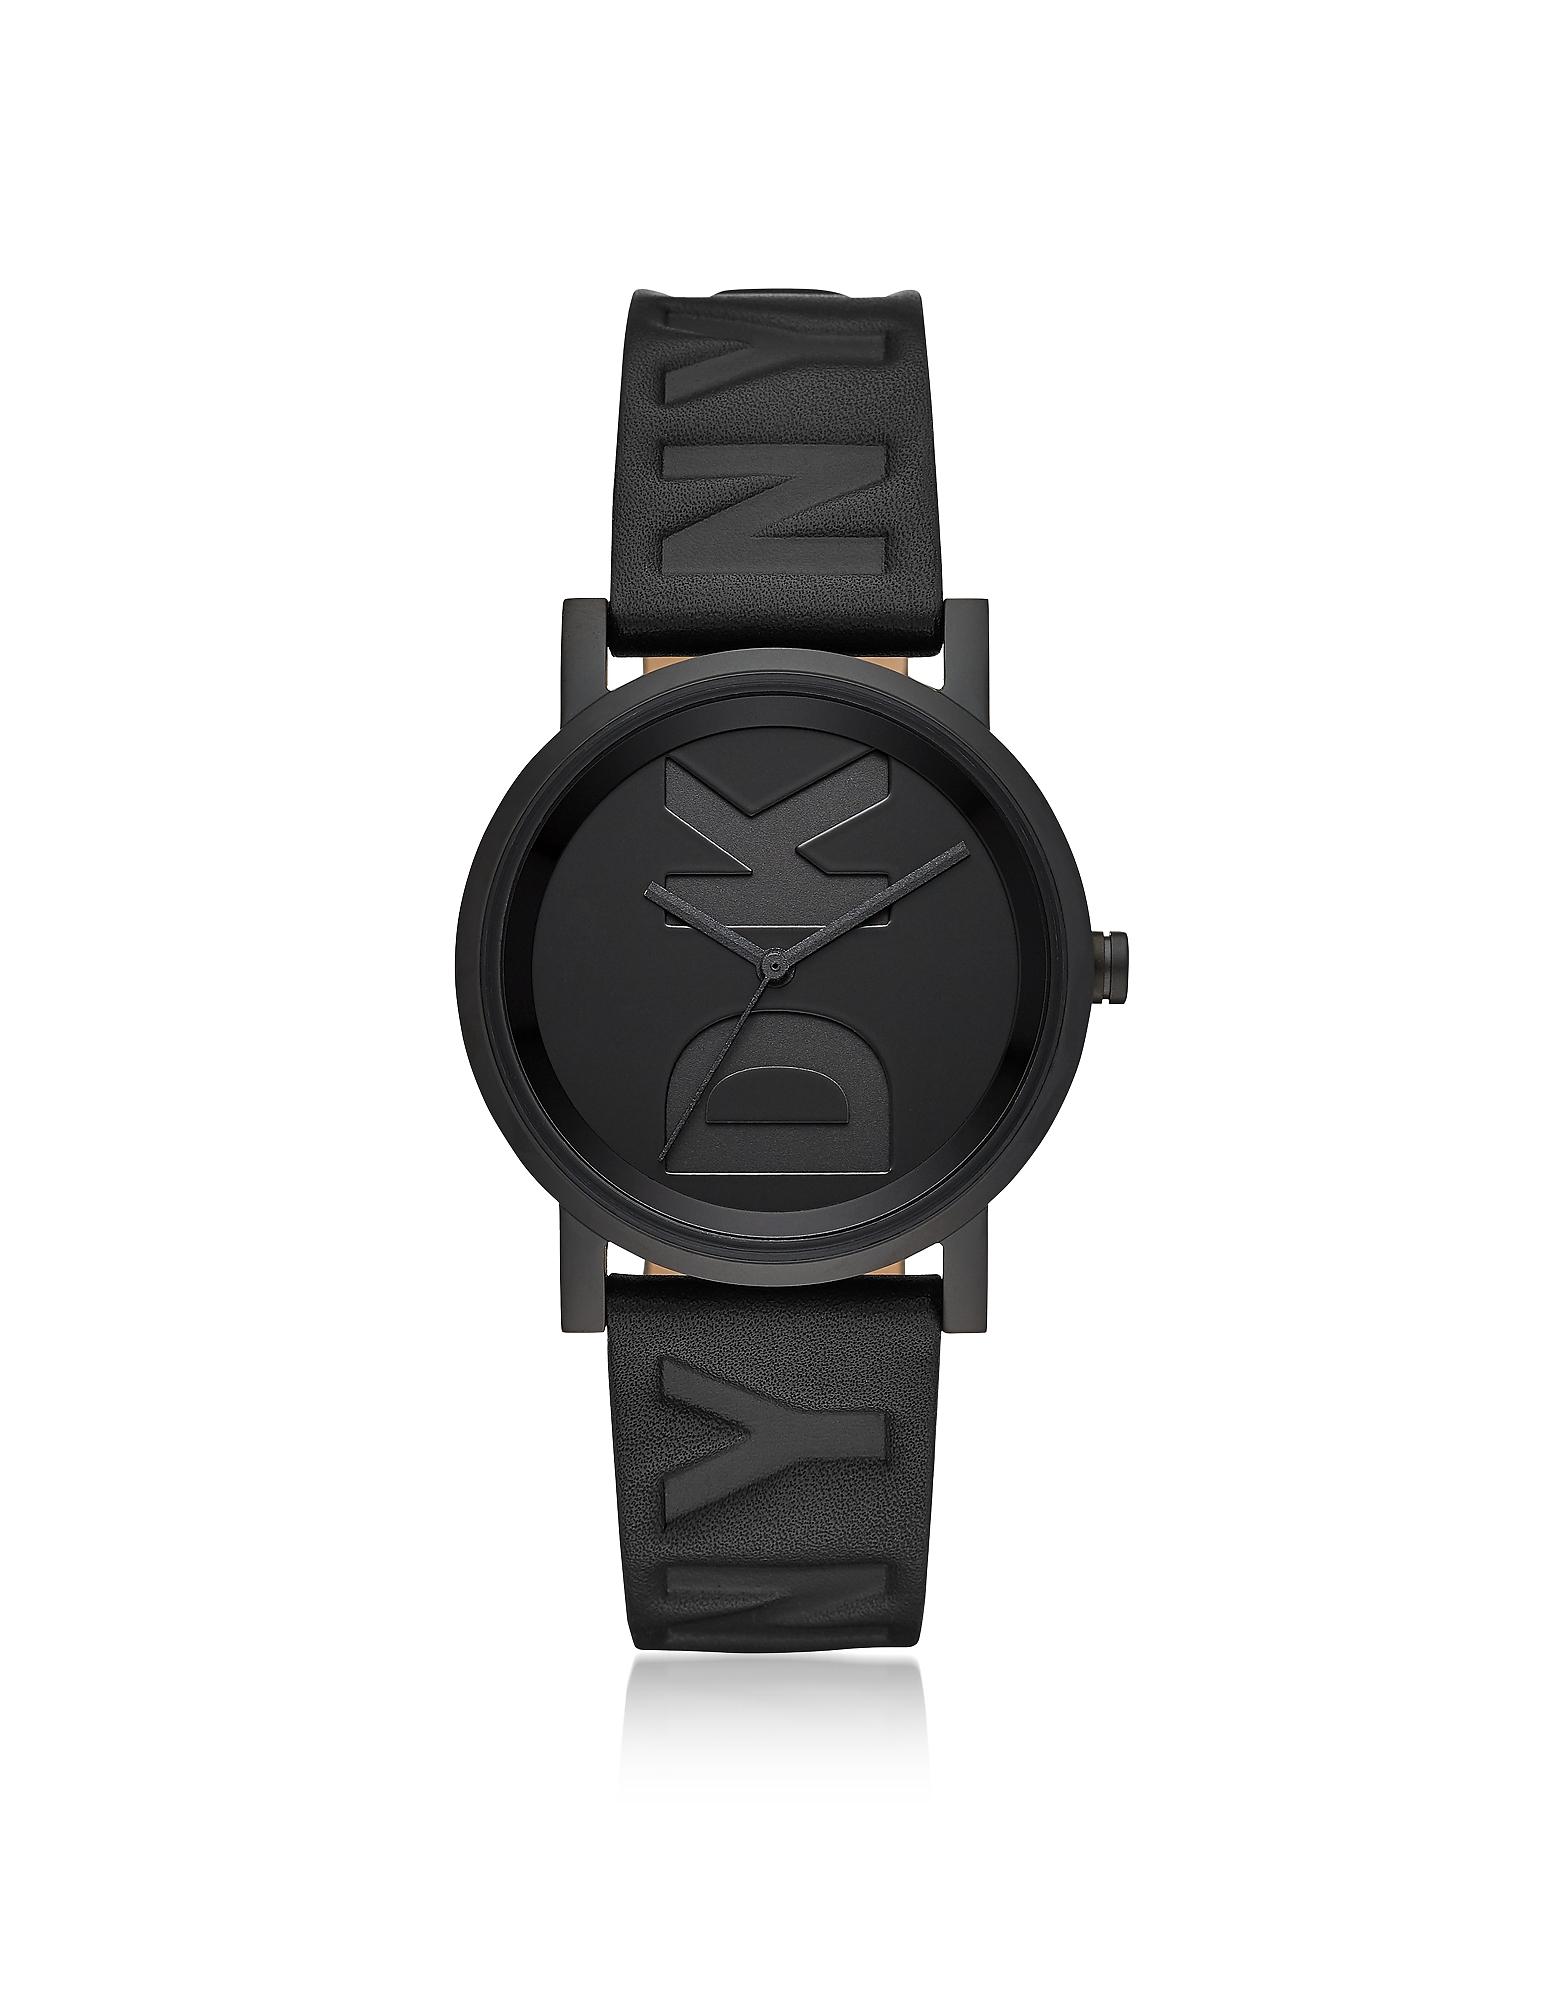 DKNY Designer Women's Watches, Soho Black Debossed Logo Watch